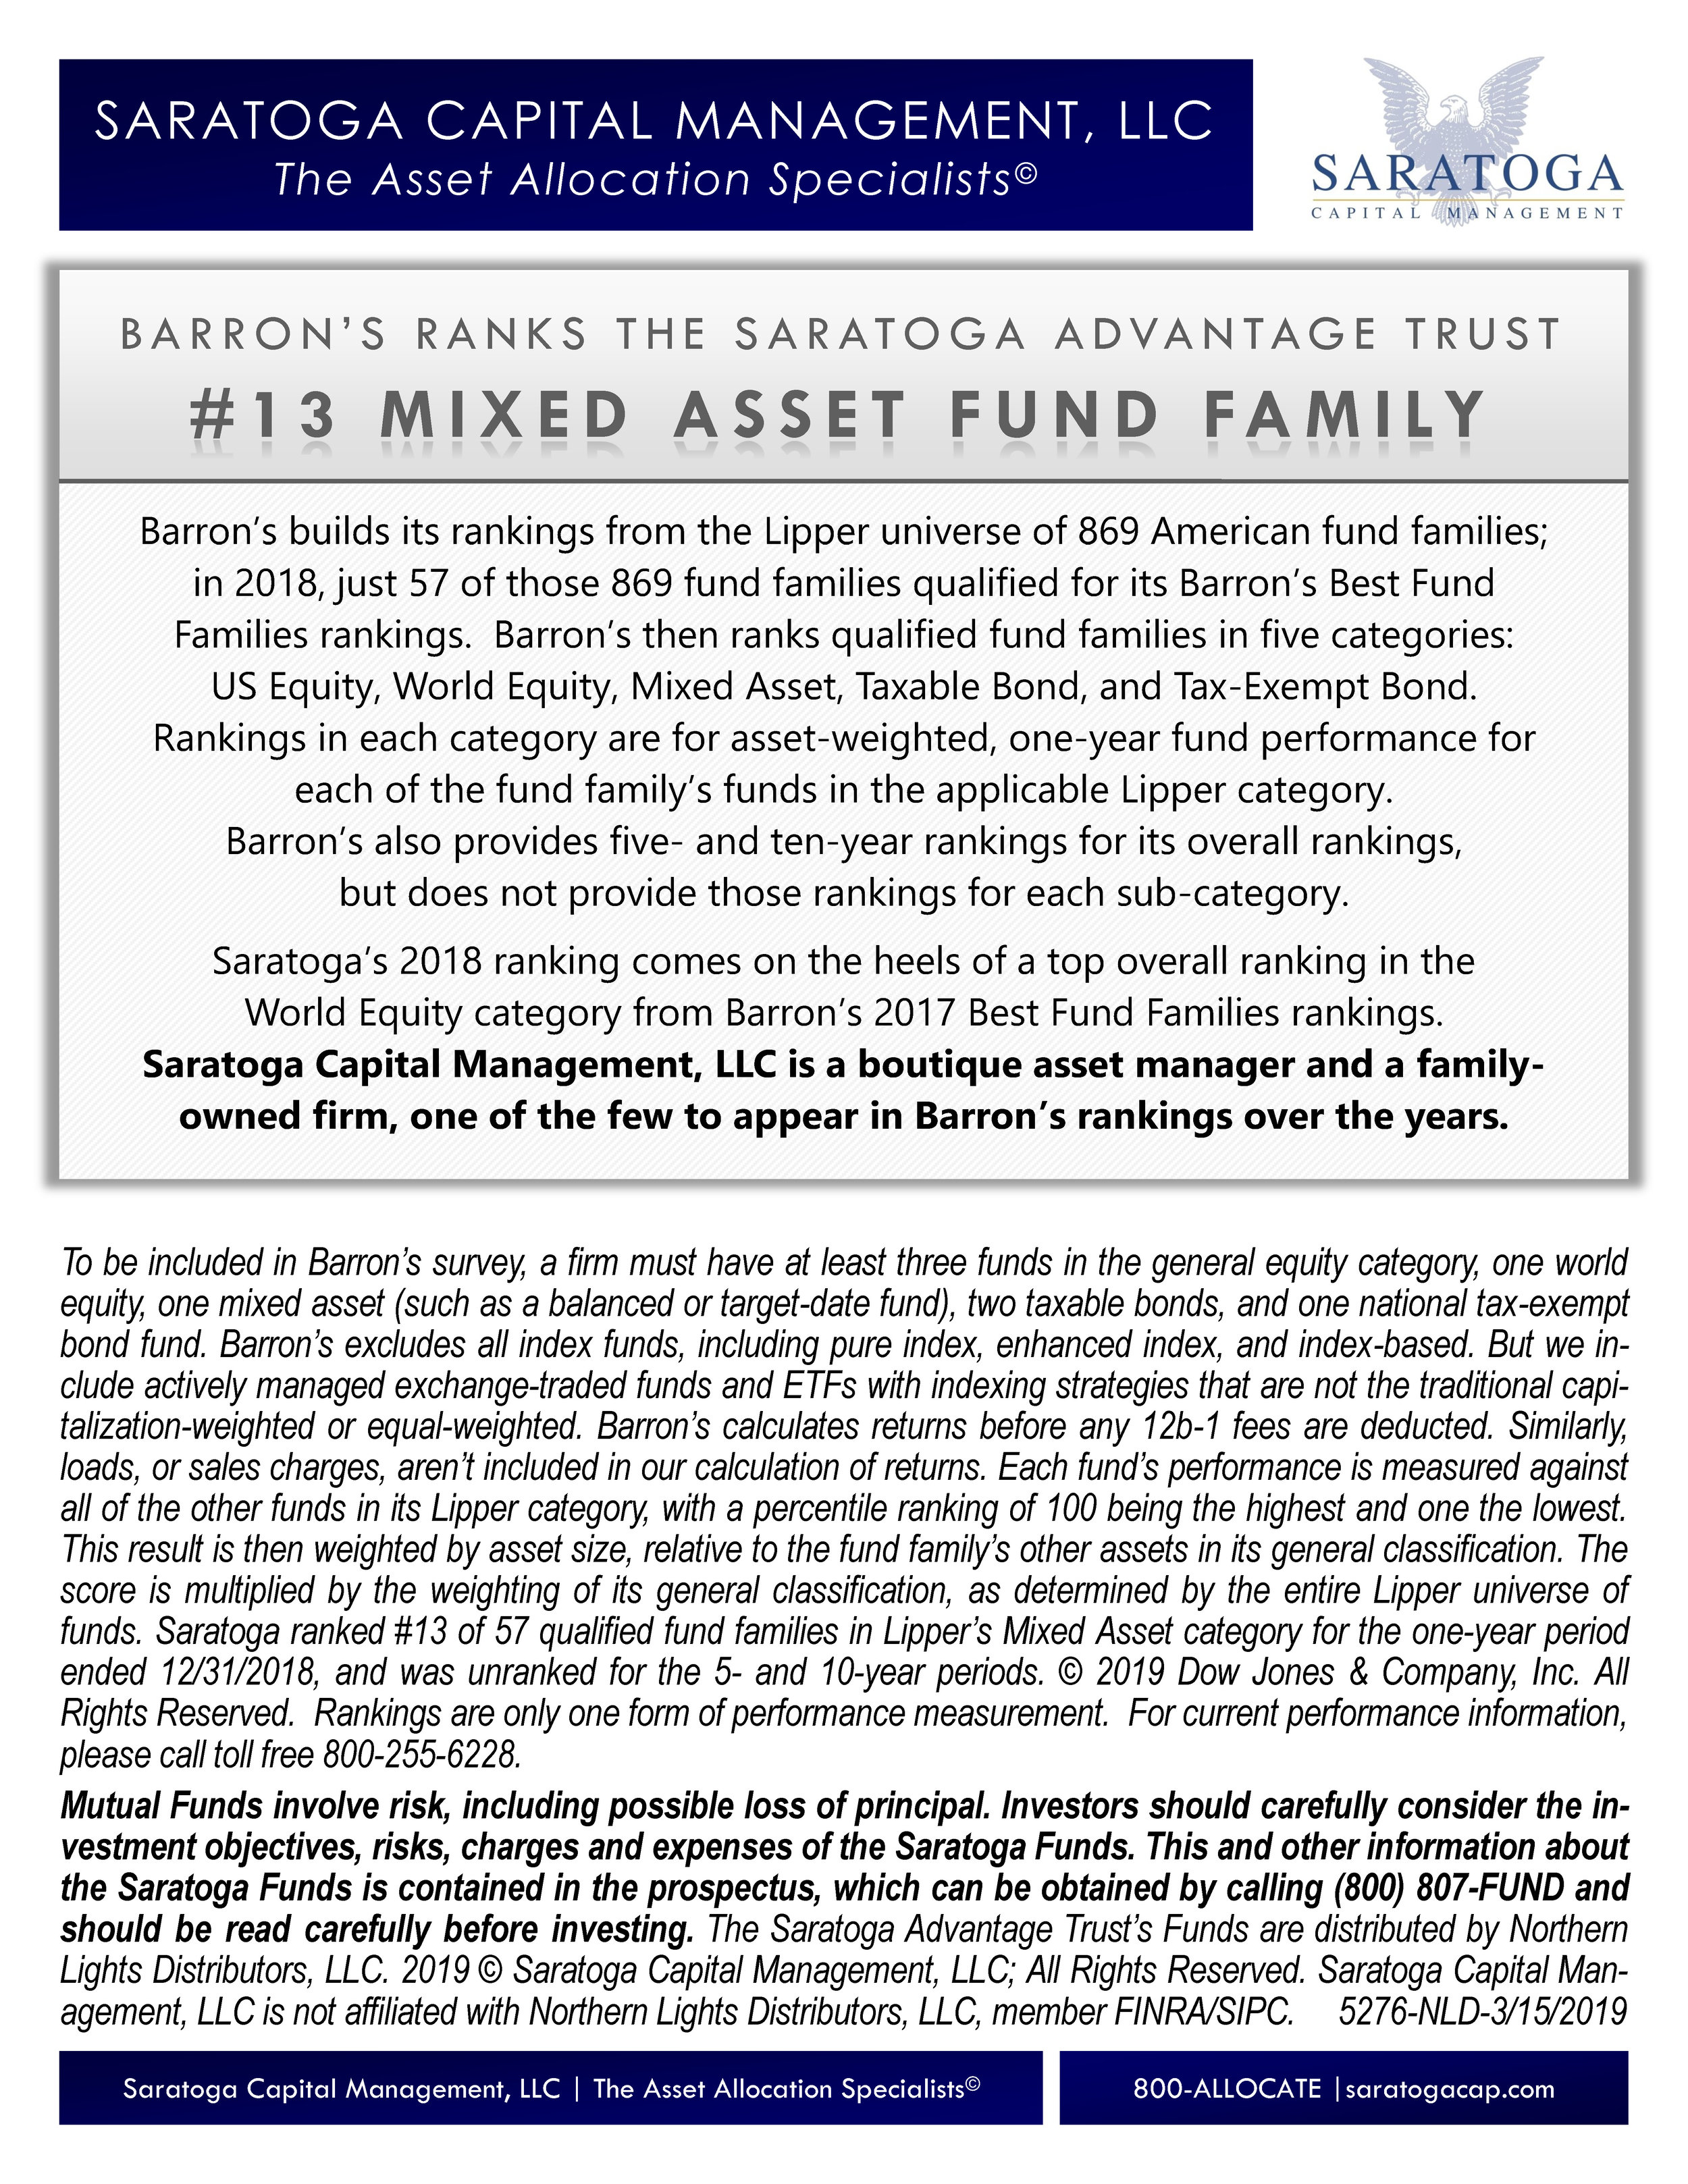 2018-12-31 SAT Barron's Ad.jpg